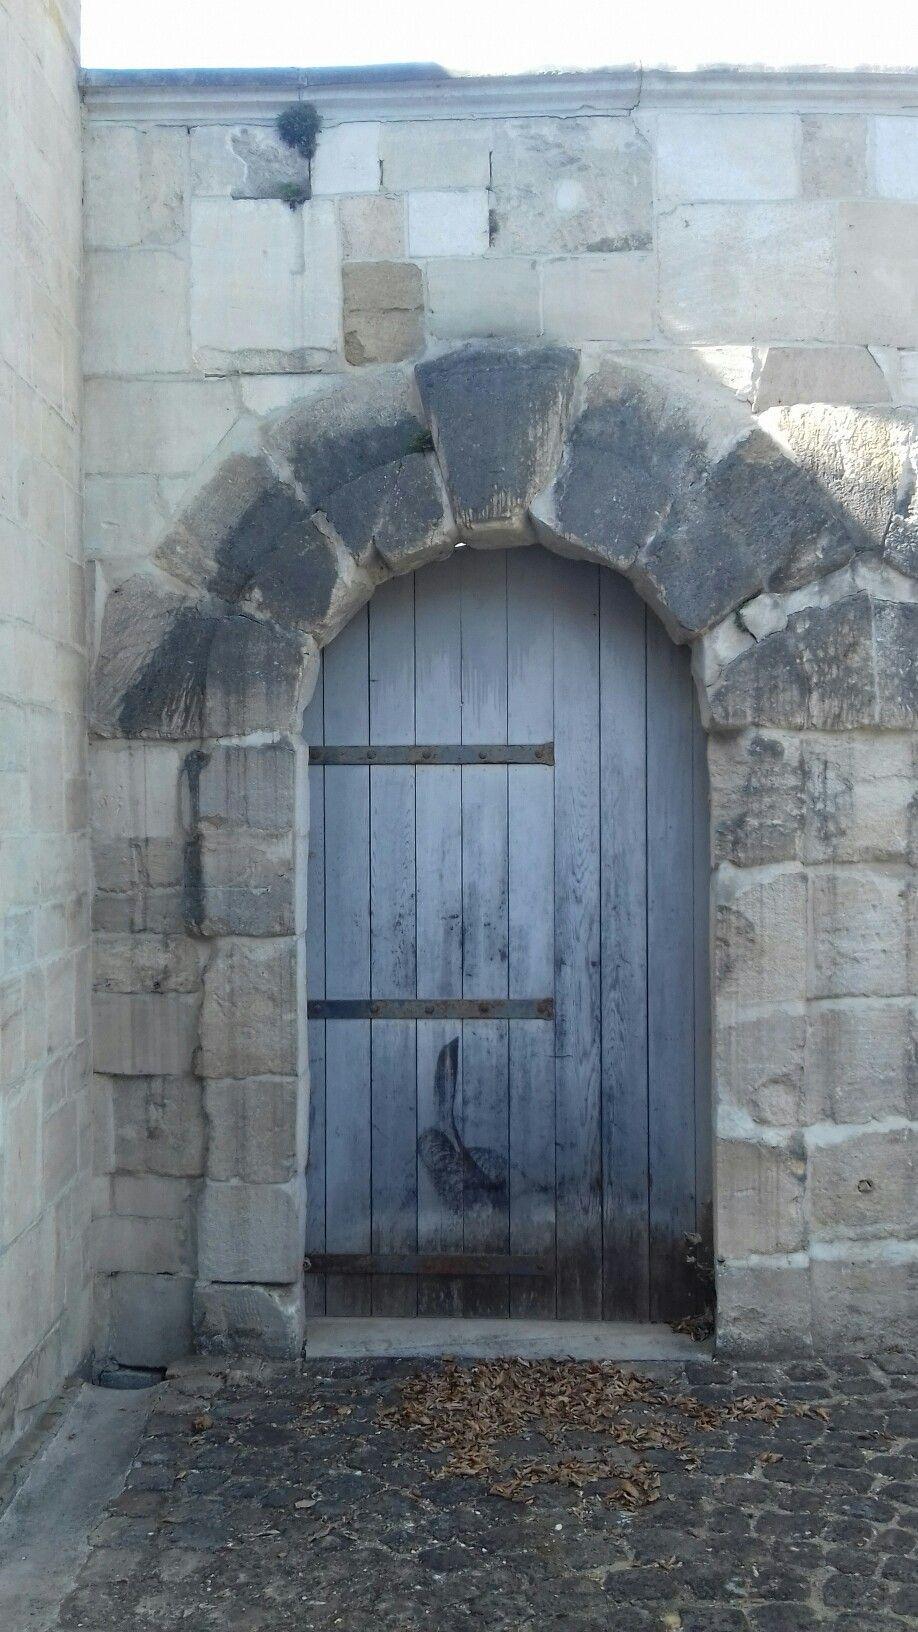 Arc En Plein Cintre : plein, cintre, Plein, Cintre, Abbaye, Cistercienne, Rochefort, Decor,, Fireplace,, Decor